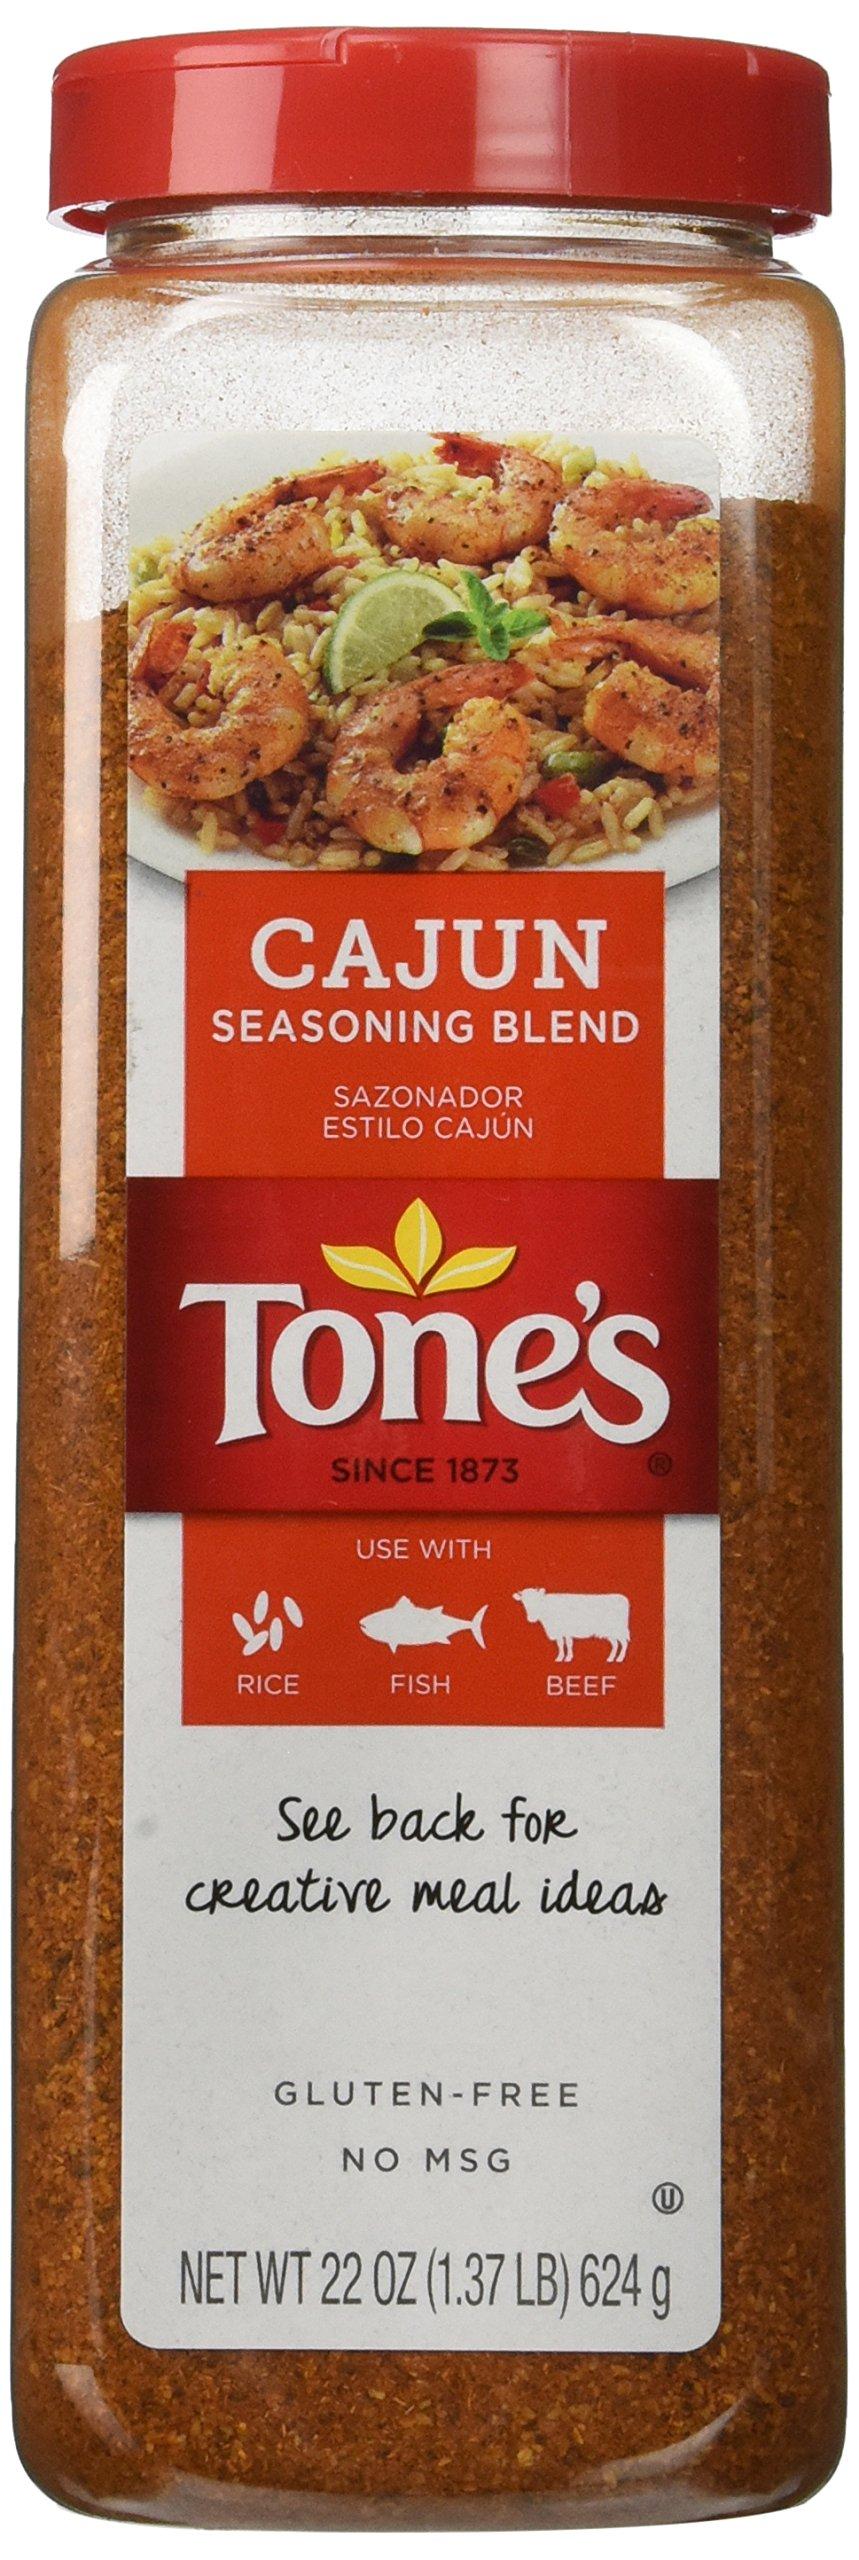 Tones Cajun Seasoning - 22 oz. shaker by Tone's (Image #1)